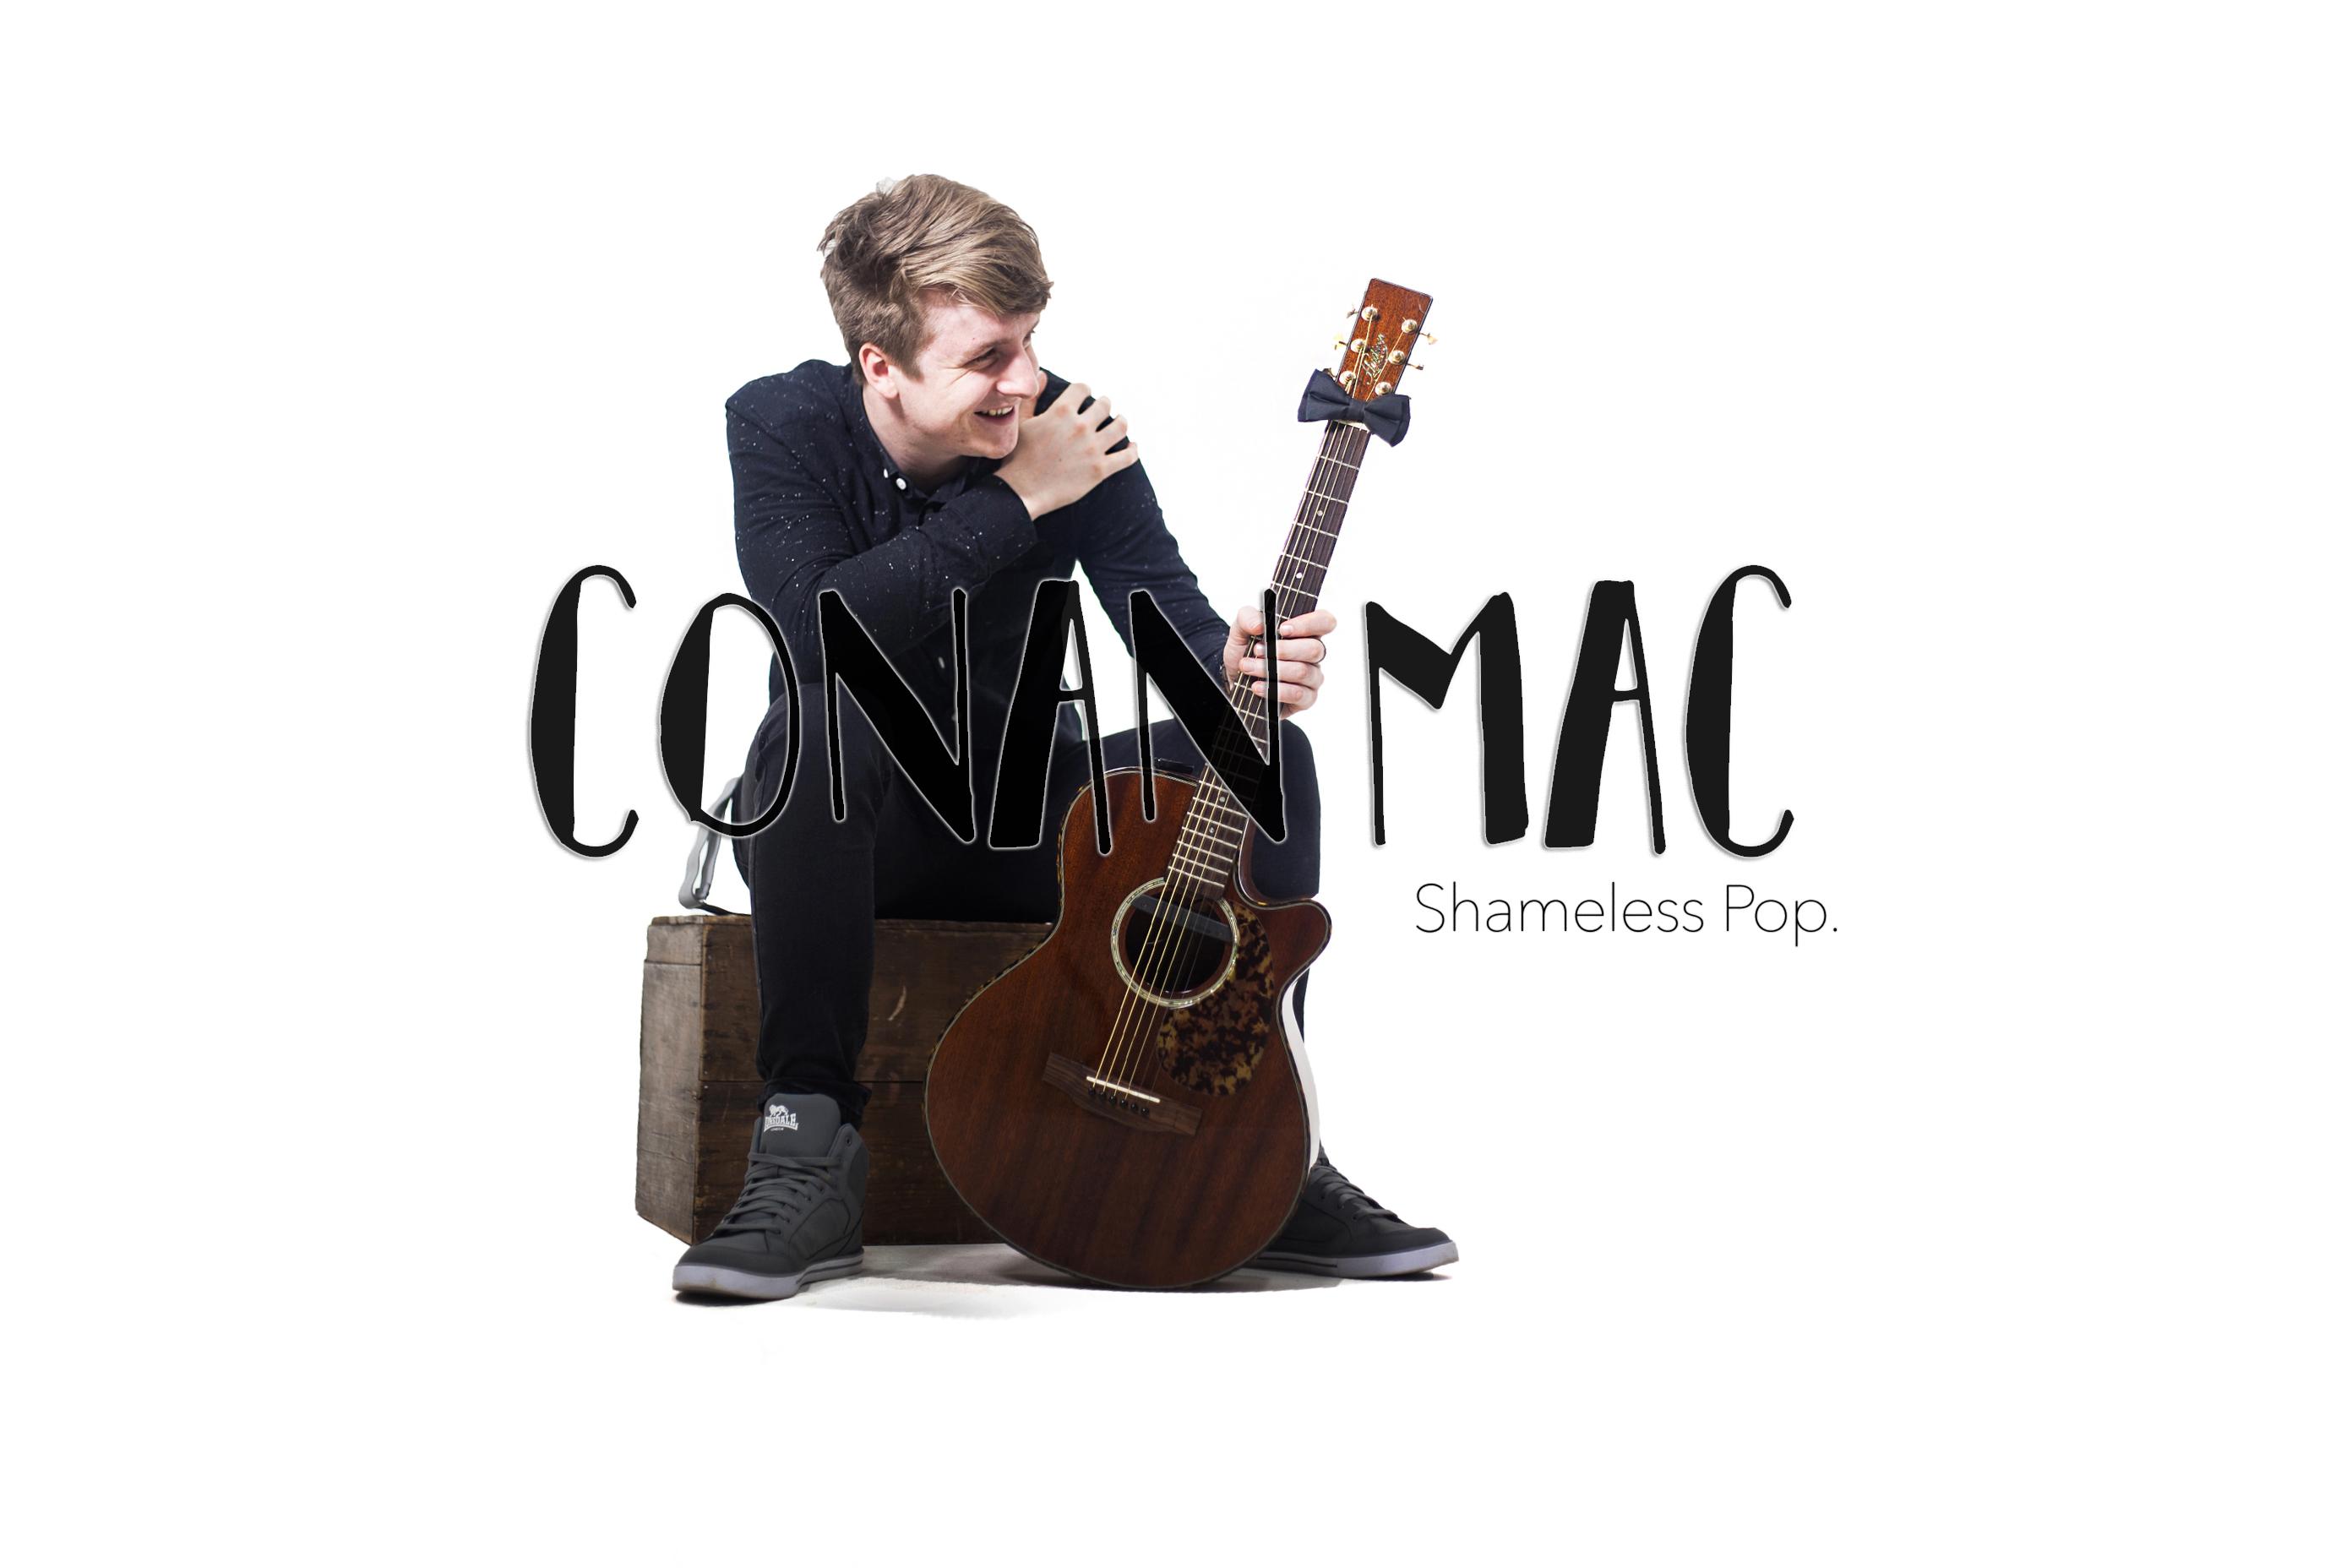 Conan Mac